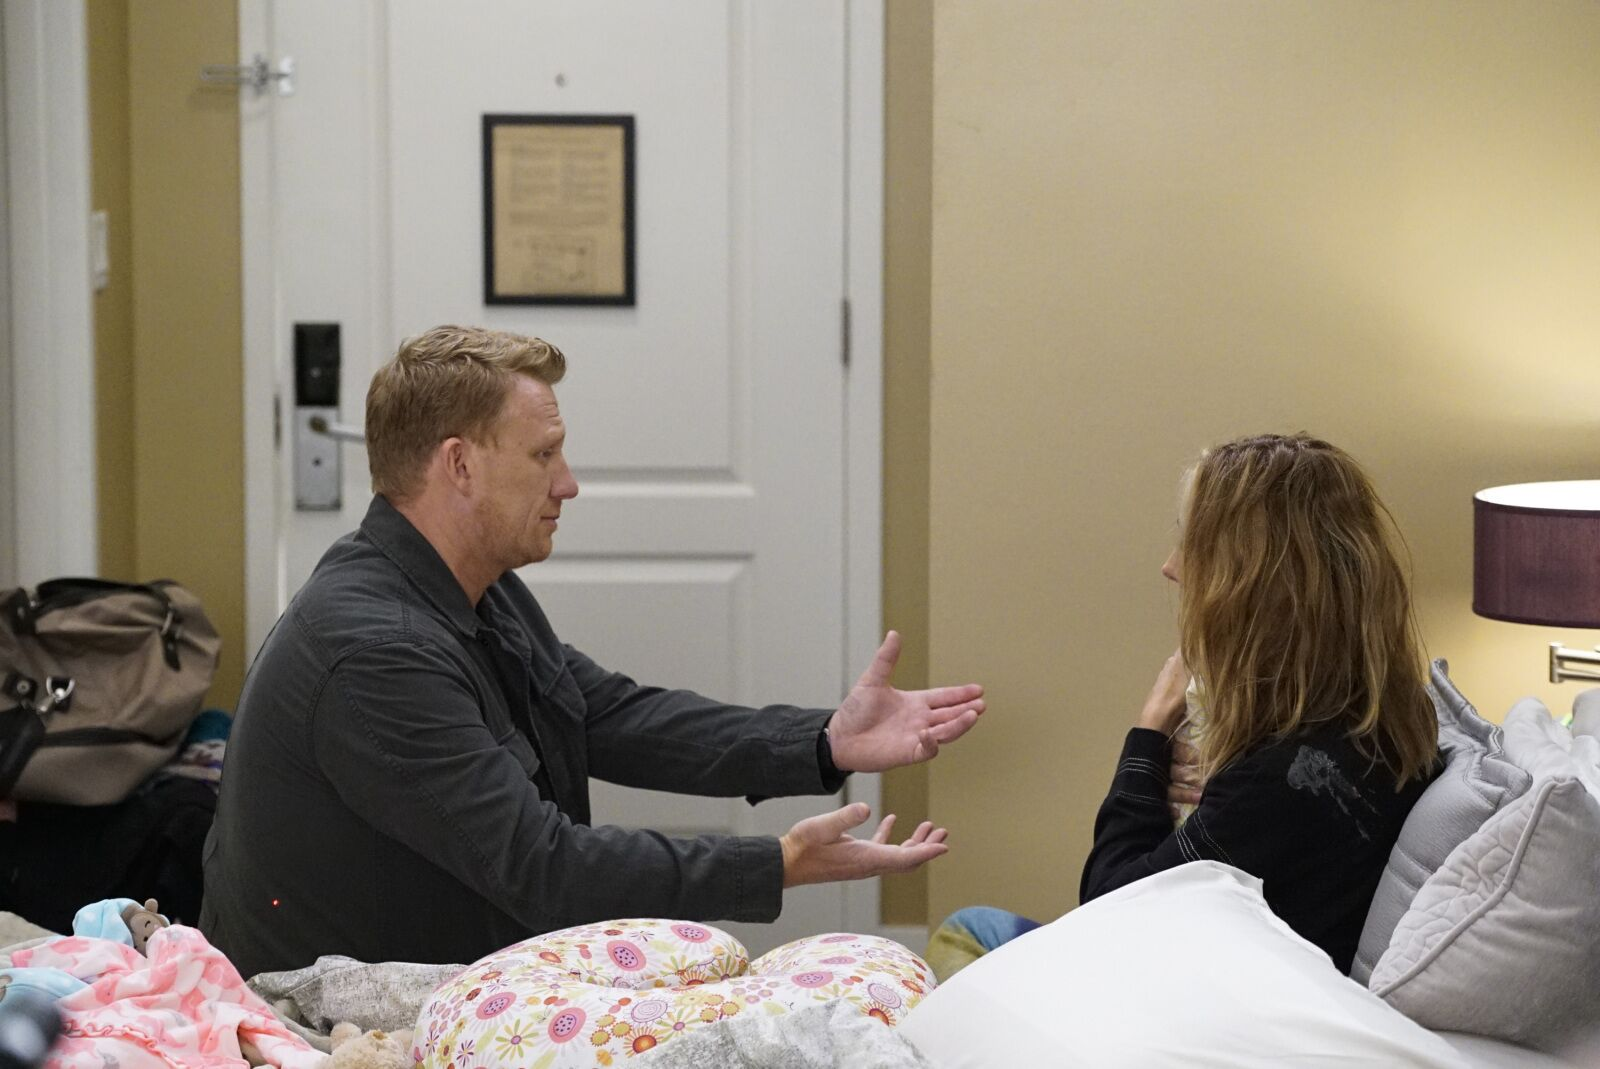 When is Grey's Anatomy season 16 premiere?